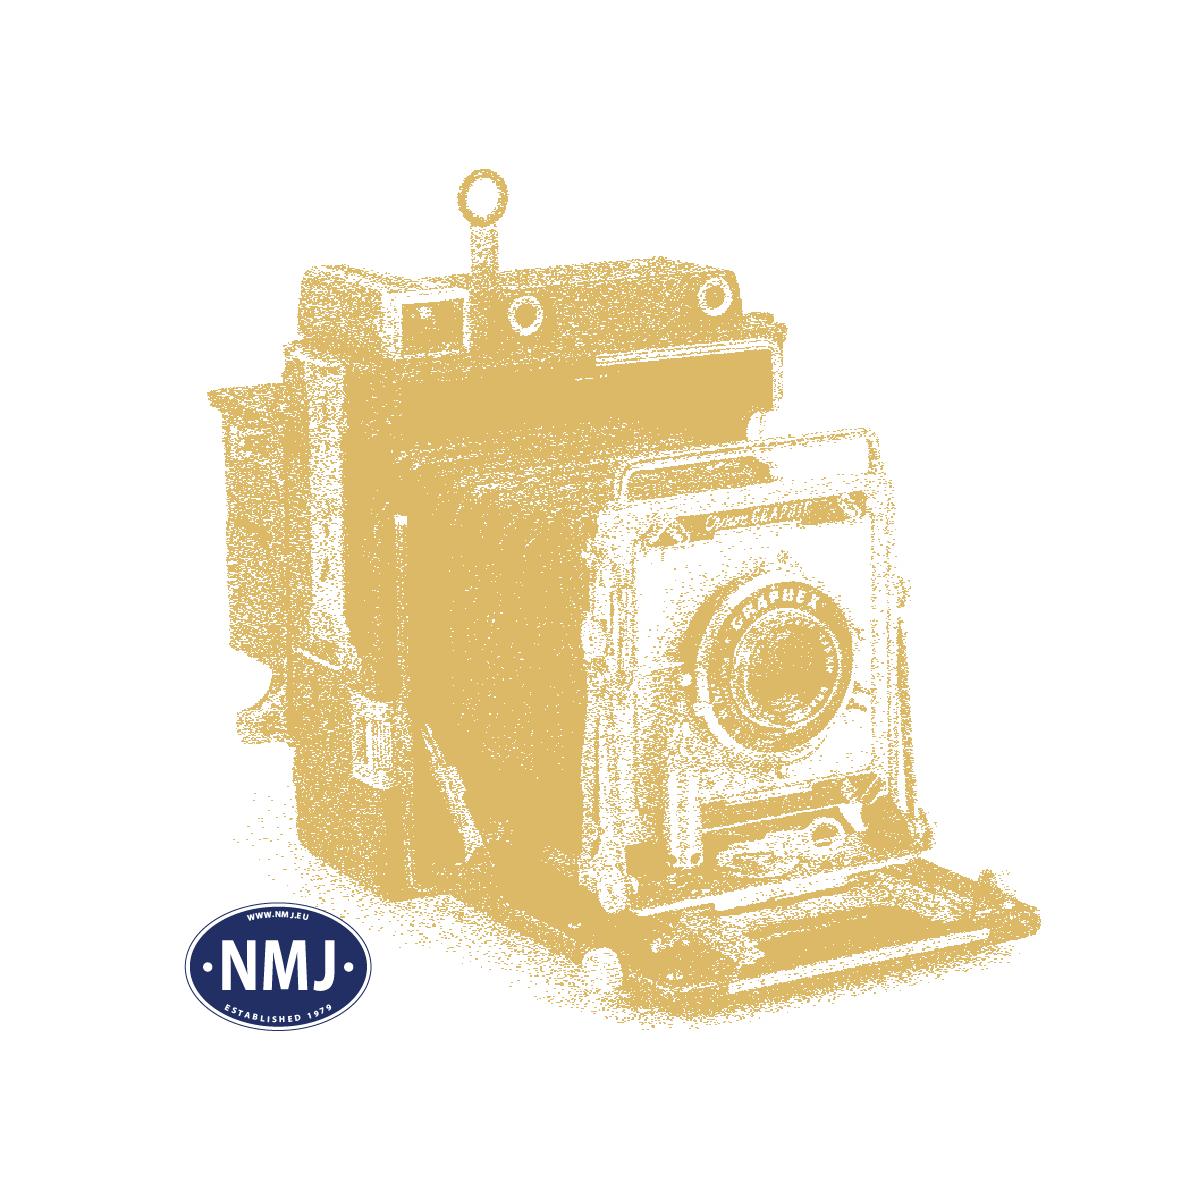 MIG1510 - Tan For 3 Tone Camo, Filters, 35 ml